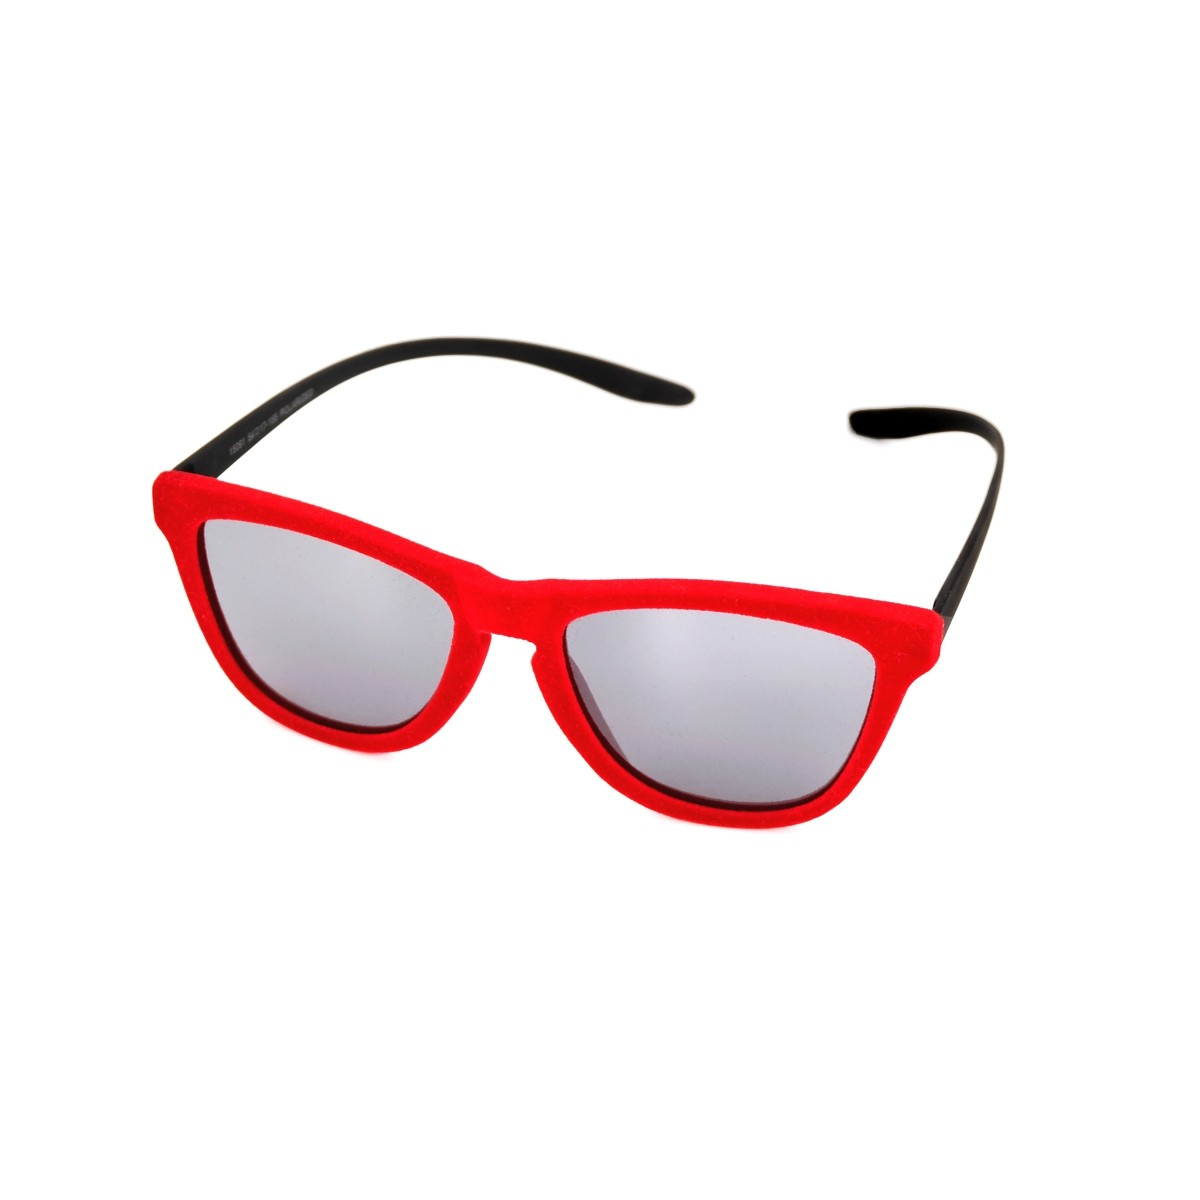 Centrostyle Koala 15091, 48,00€, Occhiali Centrostyle Rosso a forma Squadrato